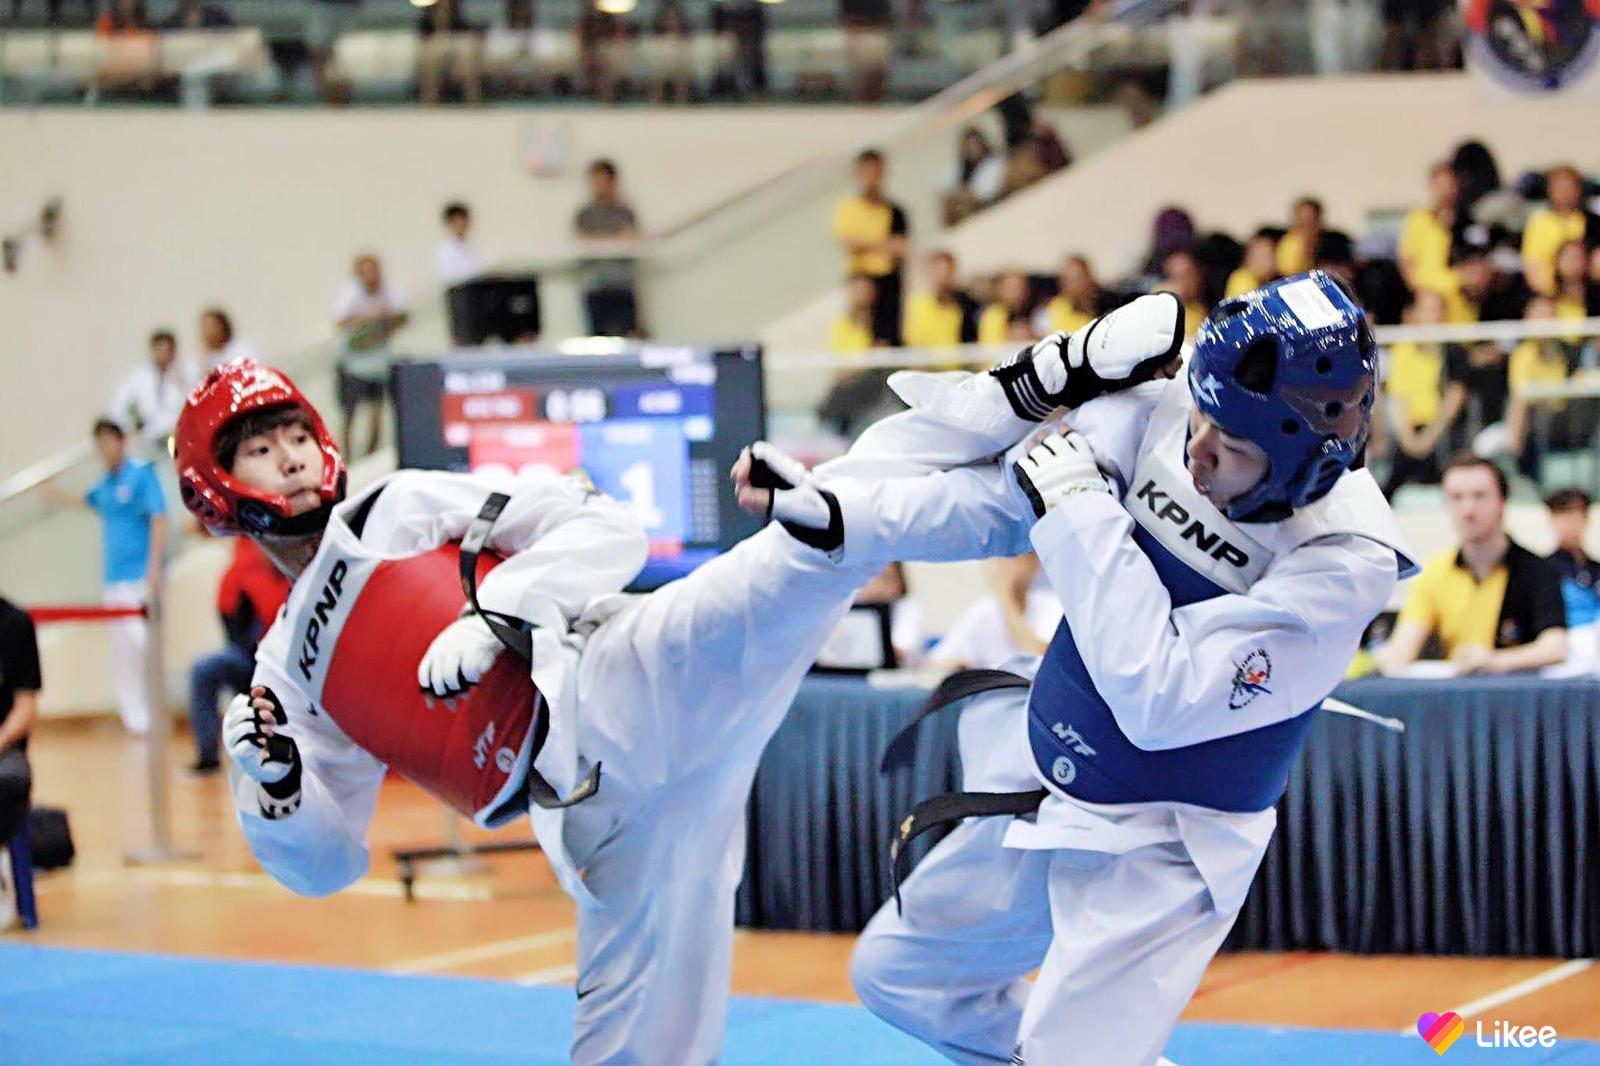 Atlet taekwondo asal Singapura, Ng Ming Wei